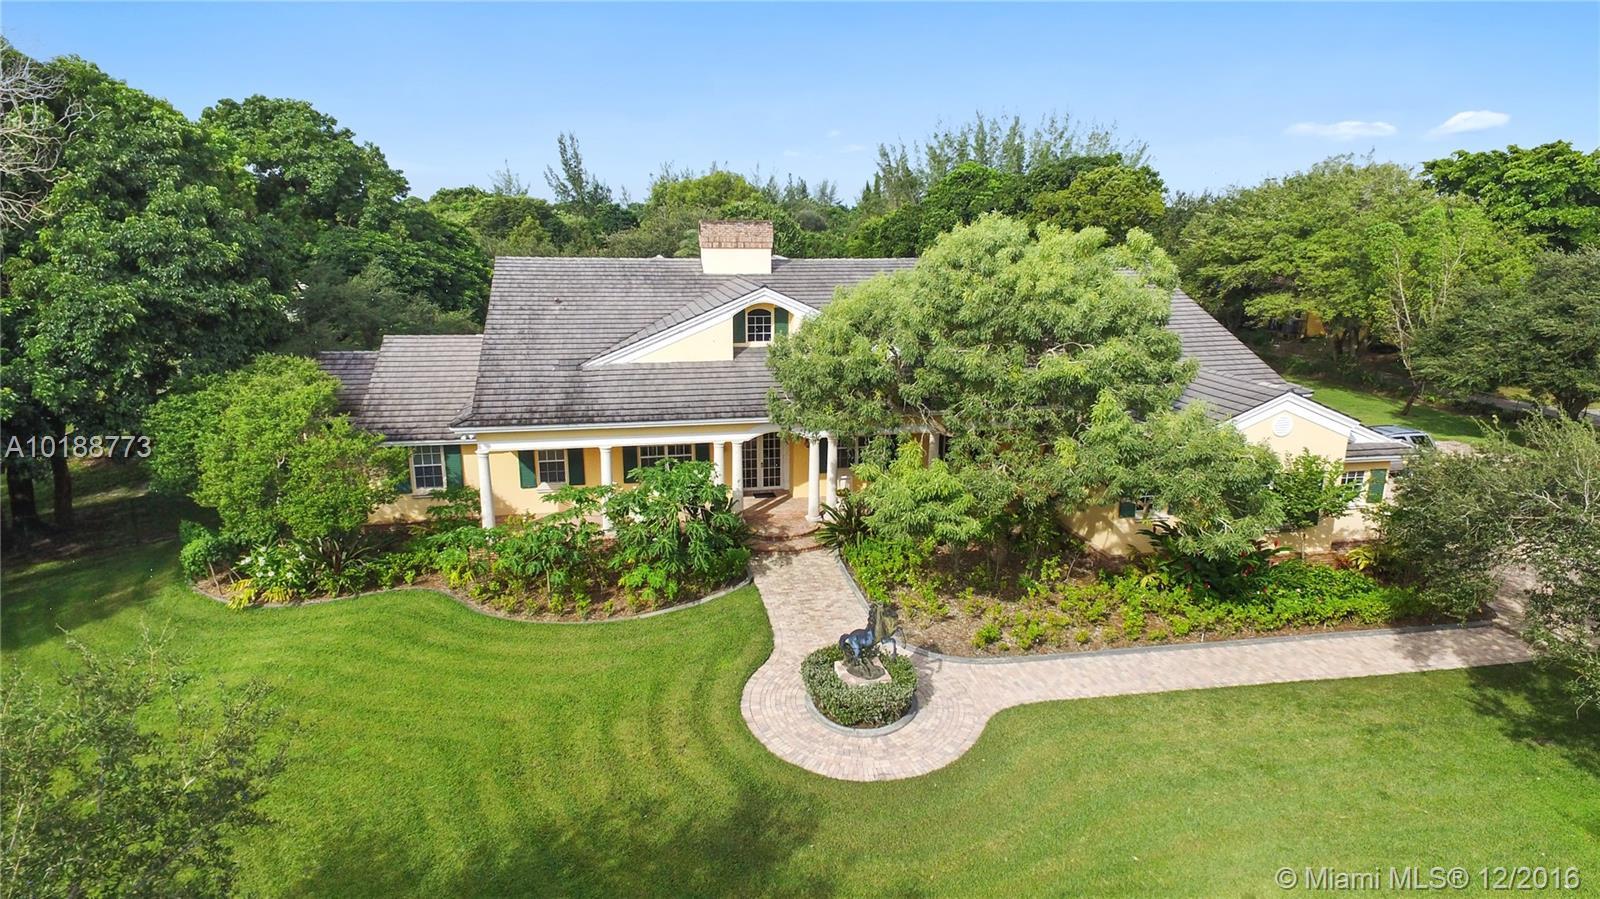 Southern florida woningen 5837 usa huizen te koop for Huis te koop in amerika